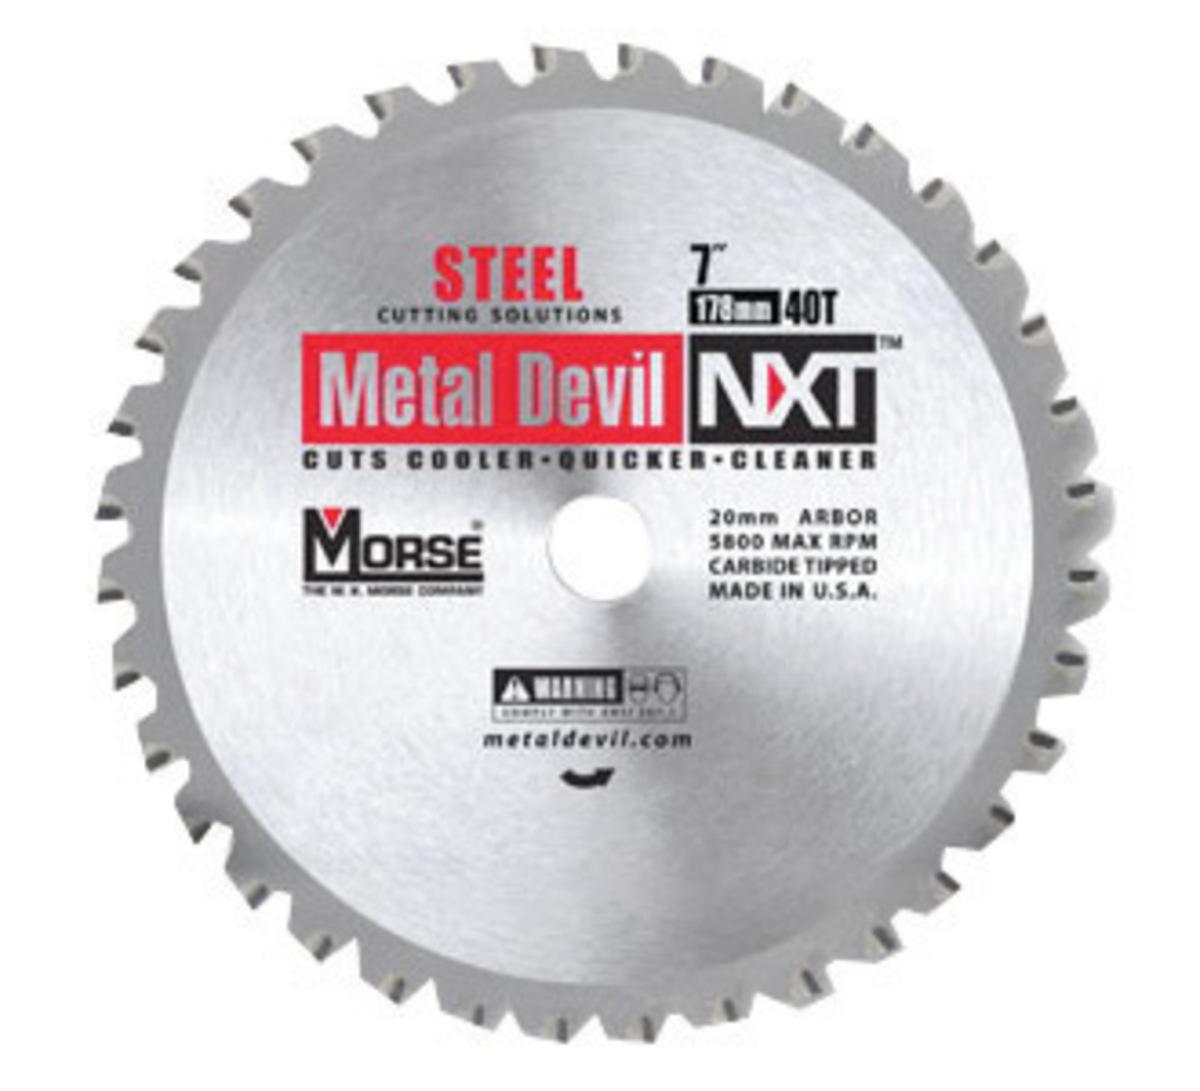 Airgas m01csm1466nsc morse 14 x 1 1800 rpm 66 tpi metal devil morse 14 greentooth Image collections